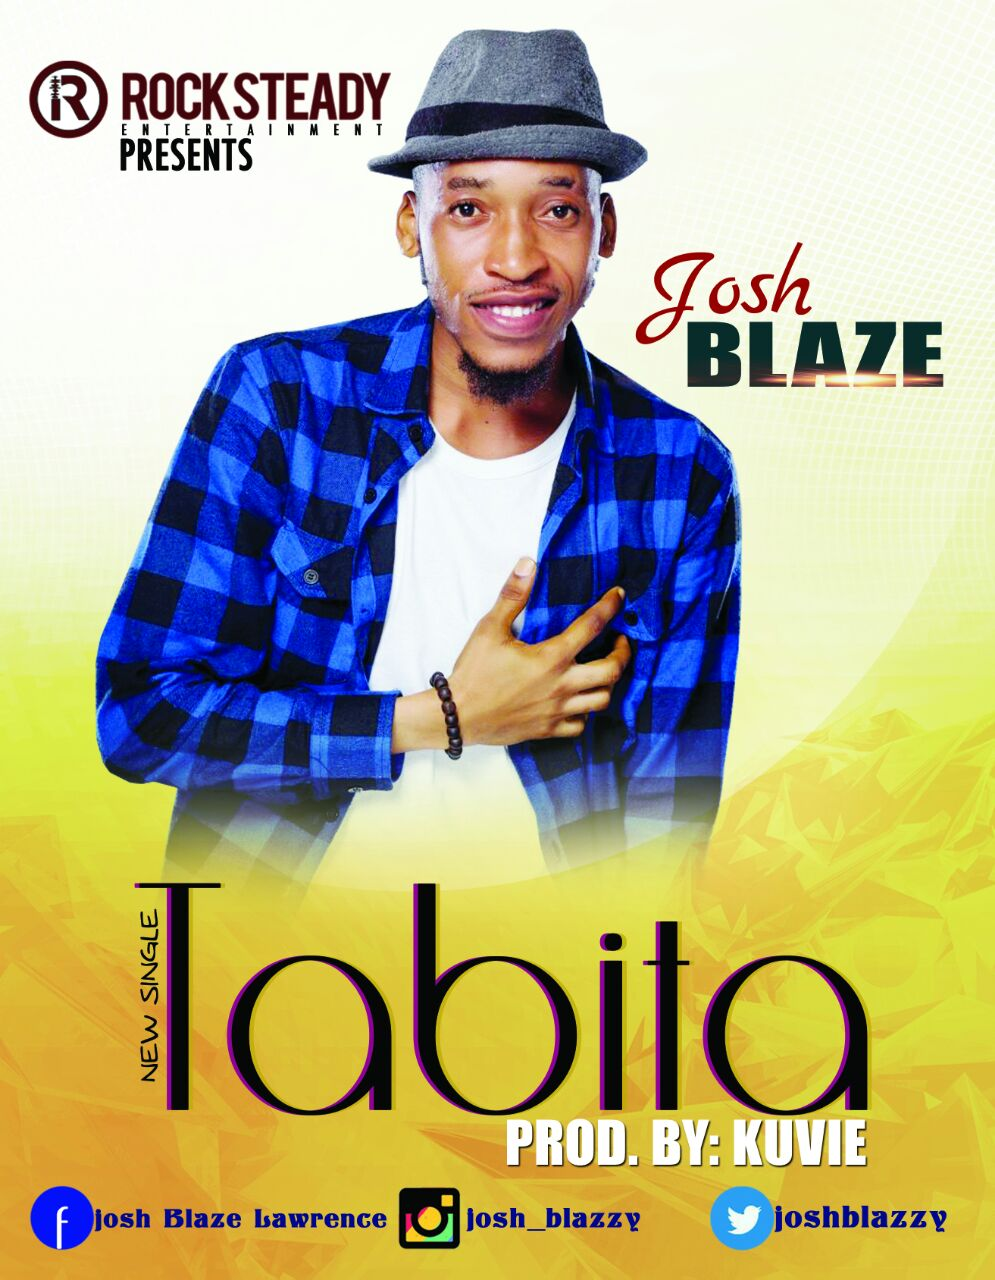 Josh Blaze – Tabitha (Prod. By Kuvie)